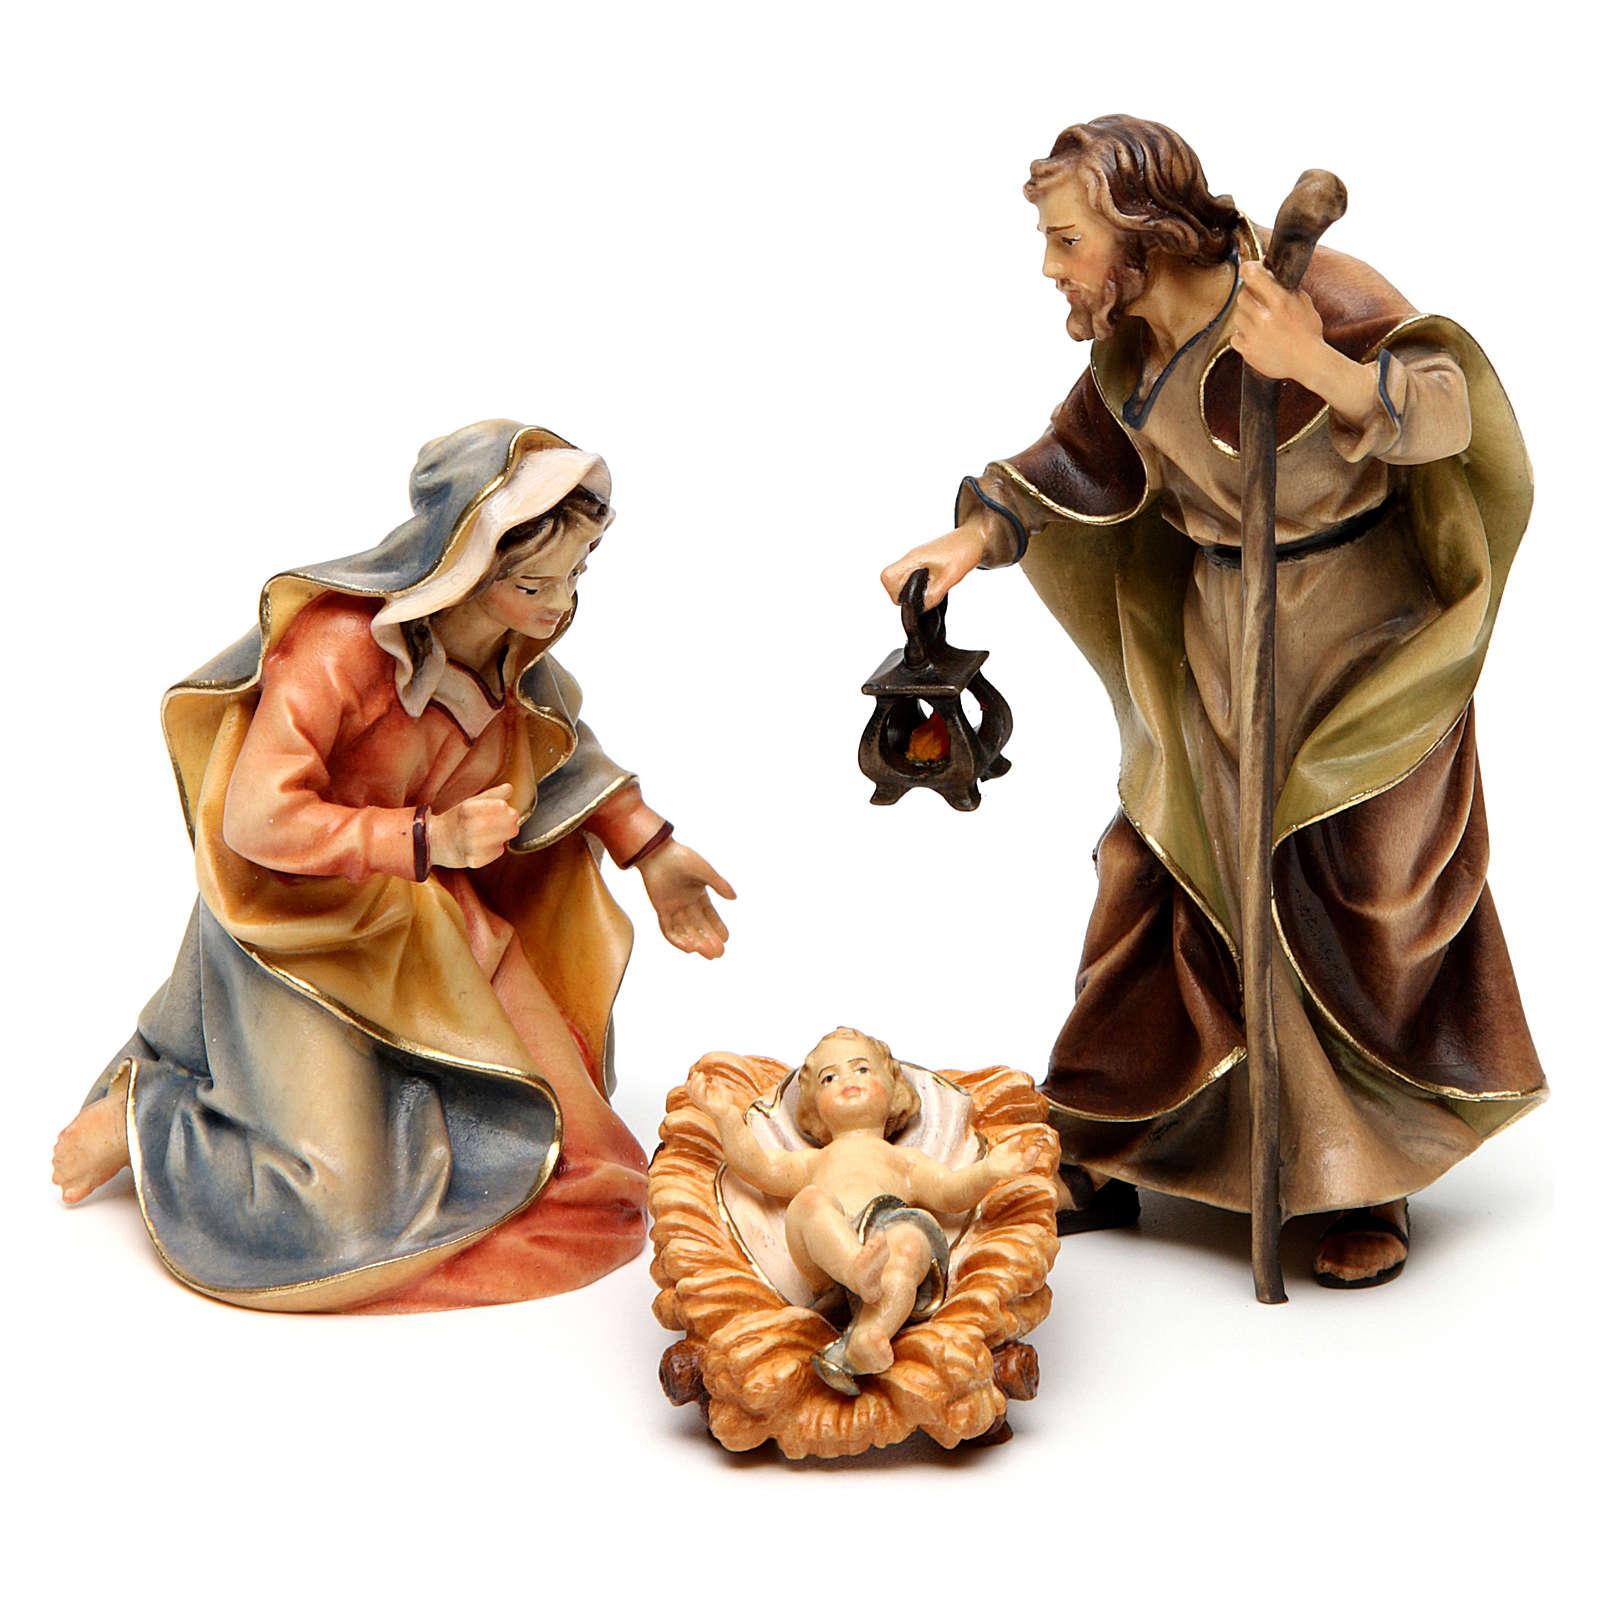 Natività presepe Original legno tre pezzi dipinto 12 cm Valgardena 4